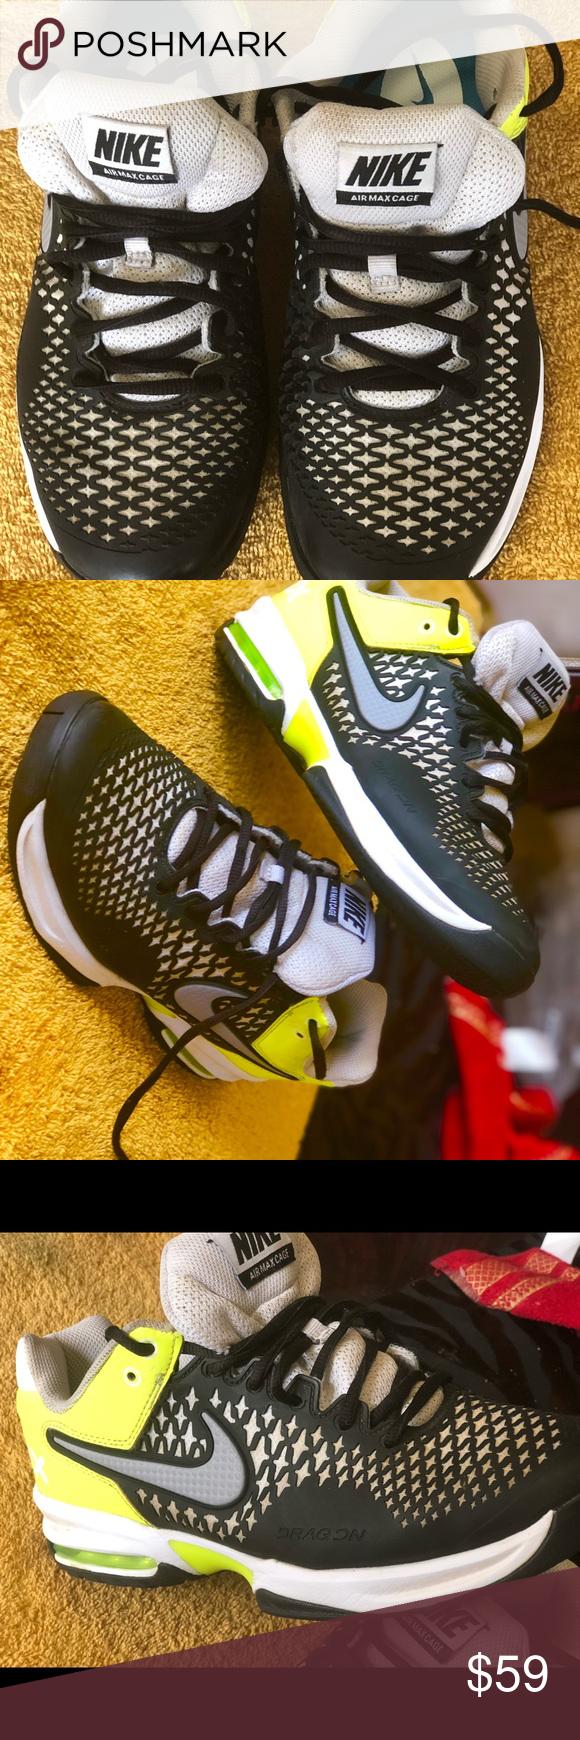 partícipe Espacio cibernético Gracias  🎉👟🎉👟🎉👟Nike AirMax cage dragon for men 🎉👟🎉 | Nike air max, Nike,  Clothes design